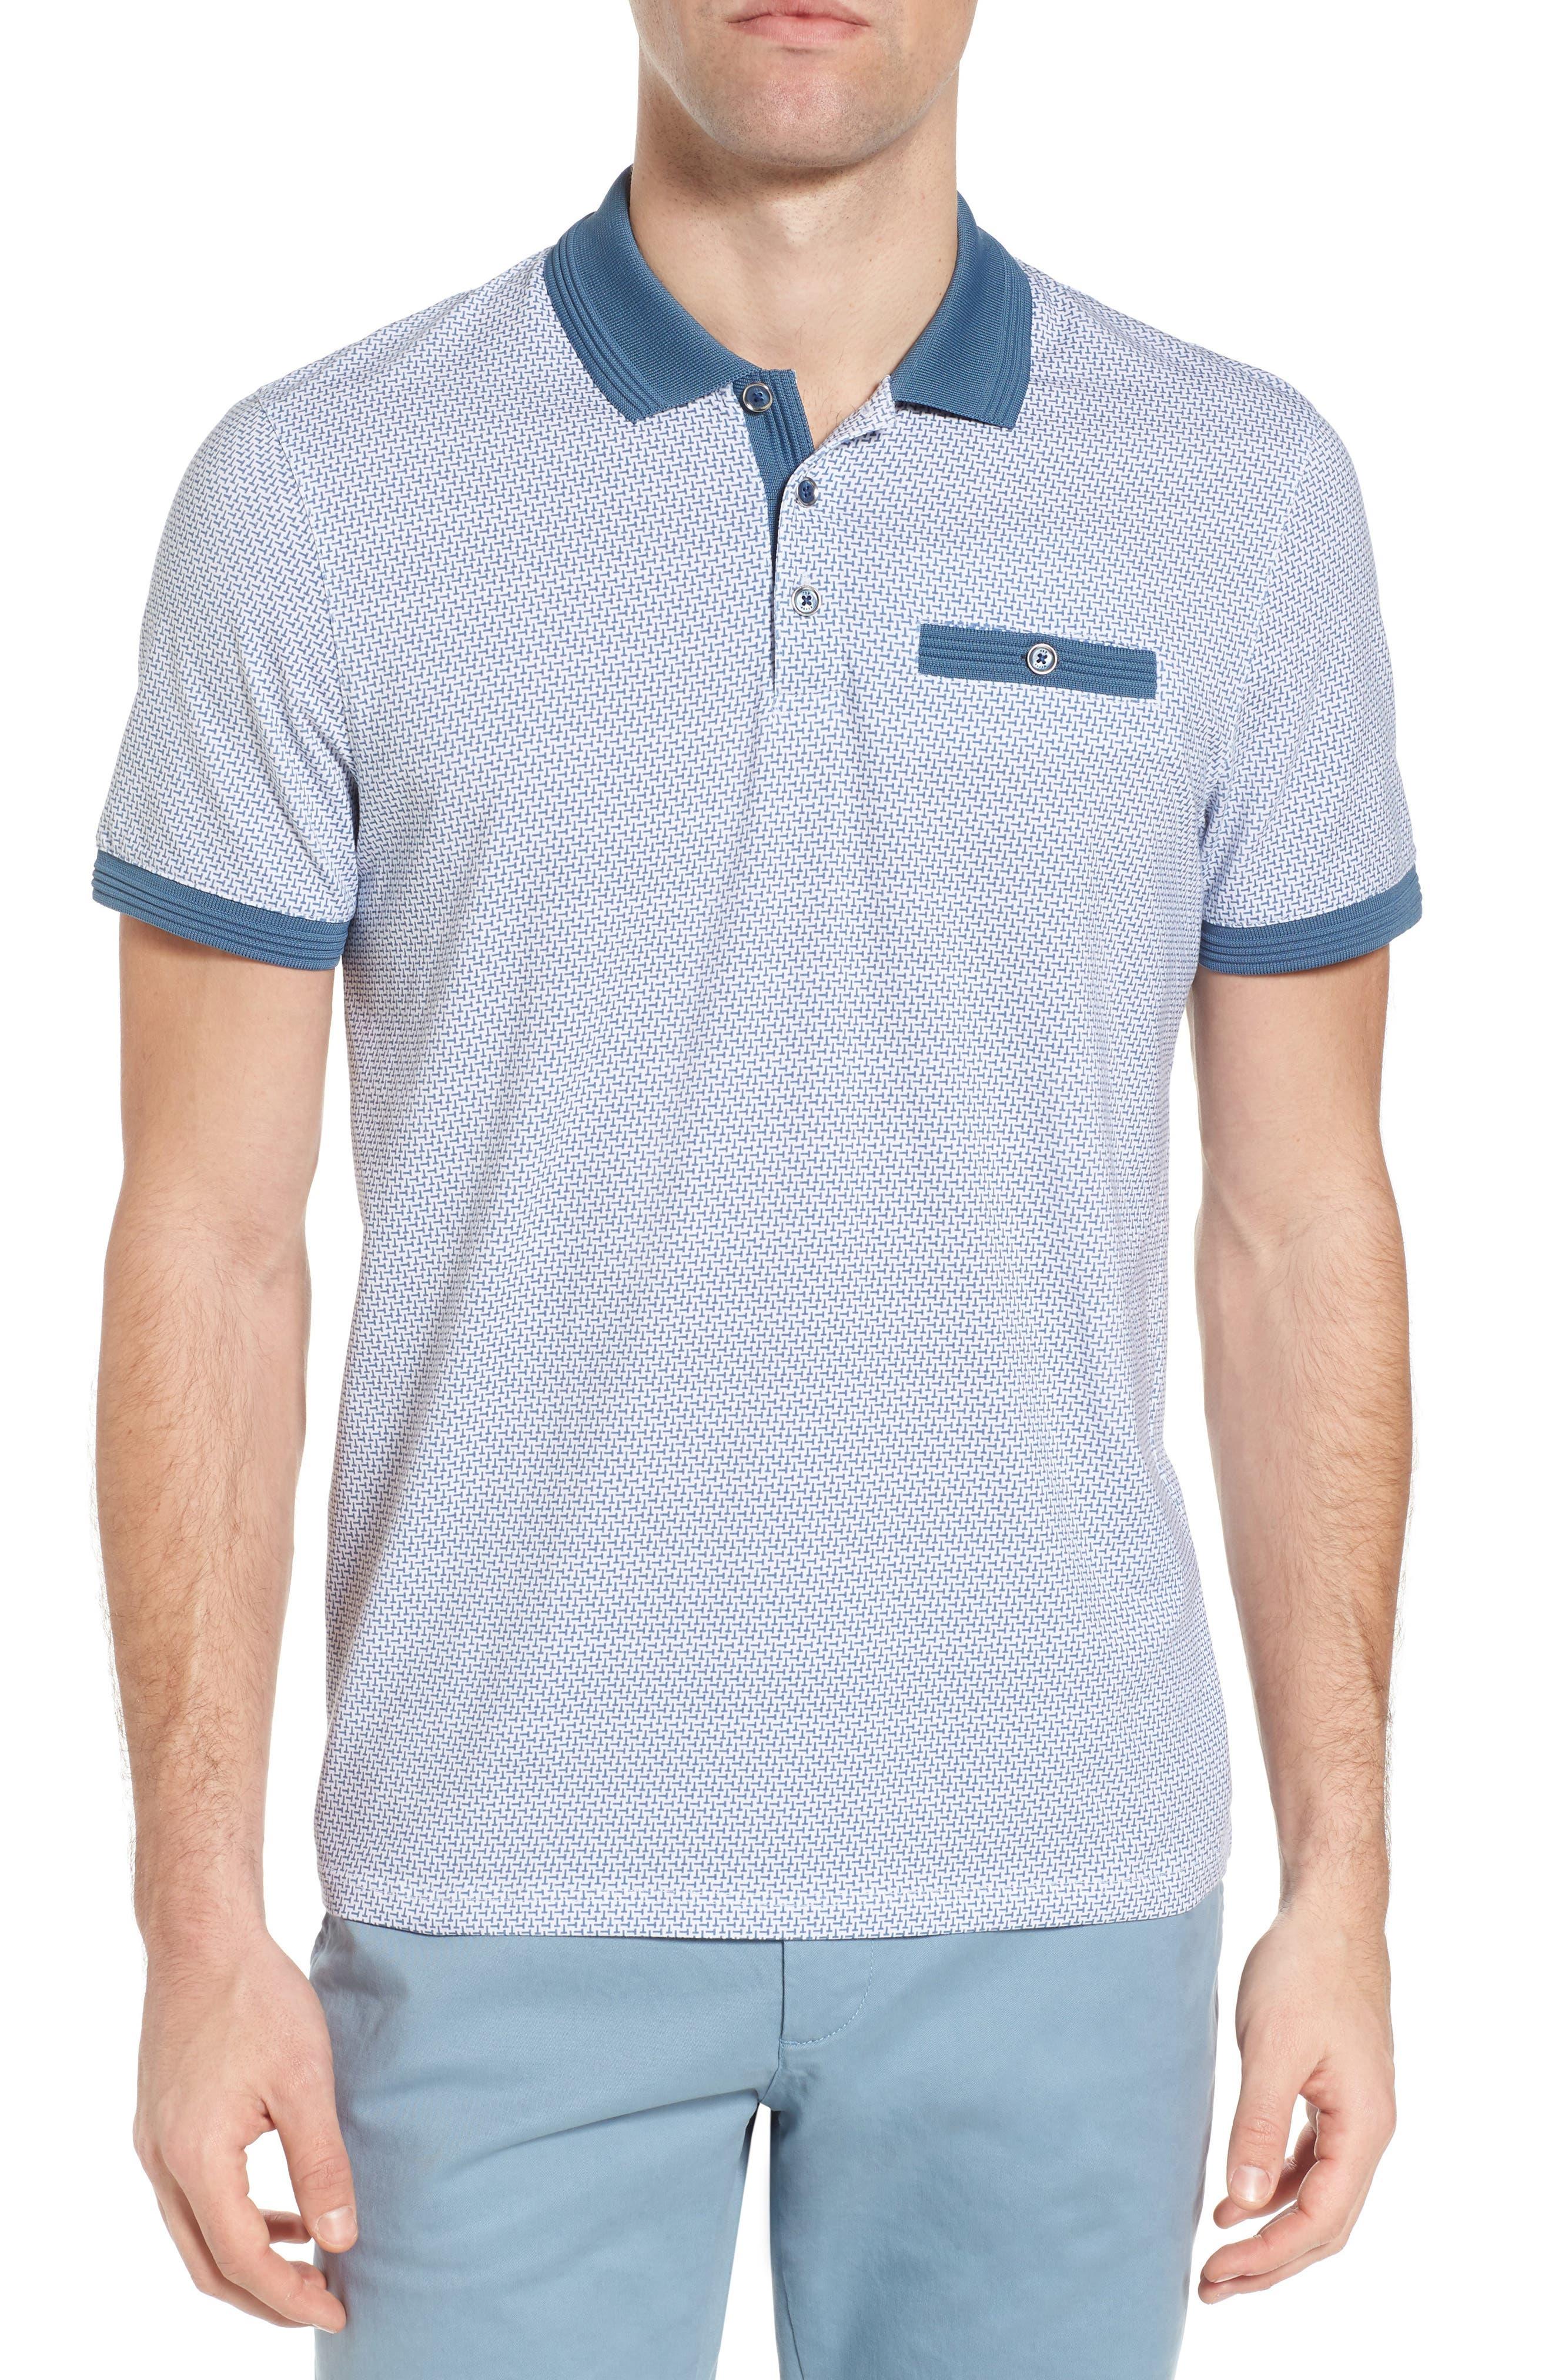 Sloughi Trim Fit Stretch Polo Shirt,                         Main,                         color, Blue